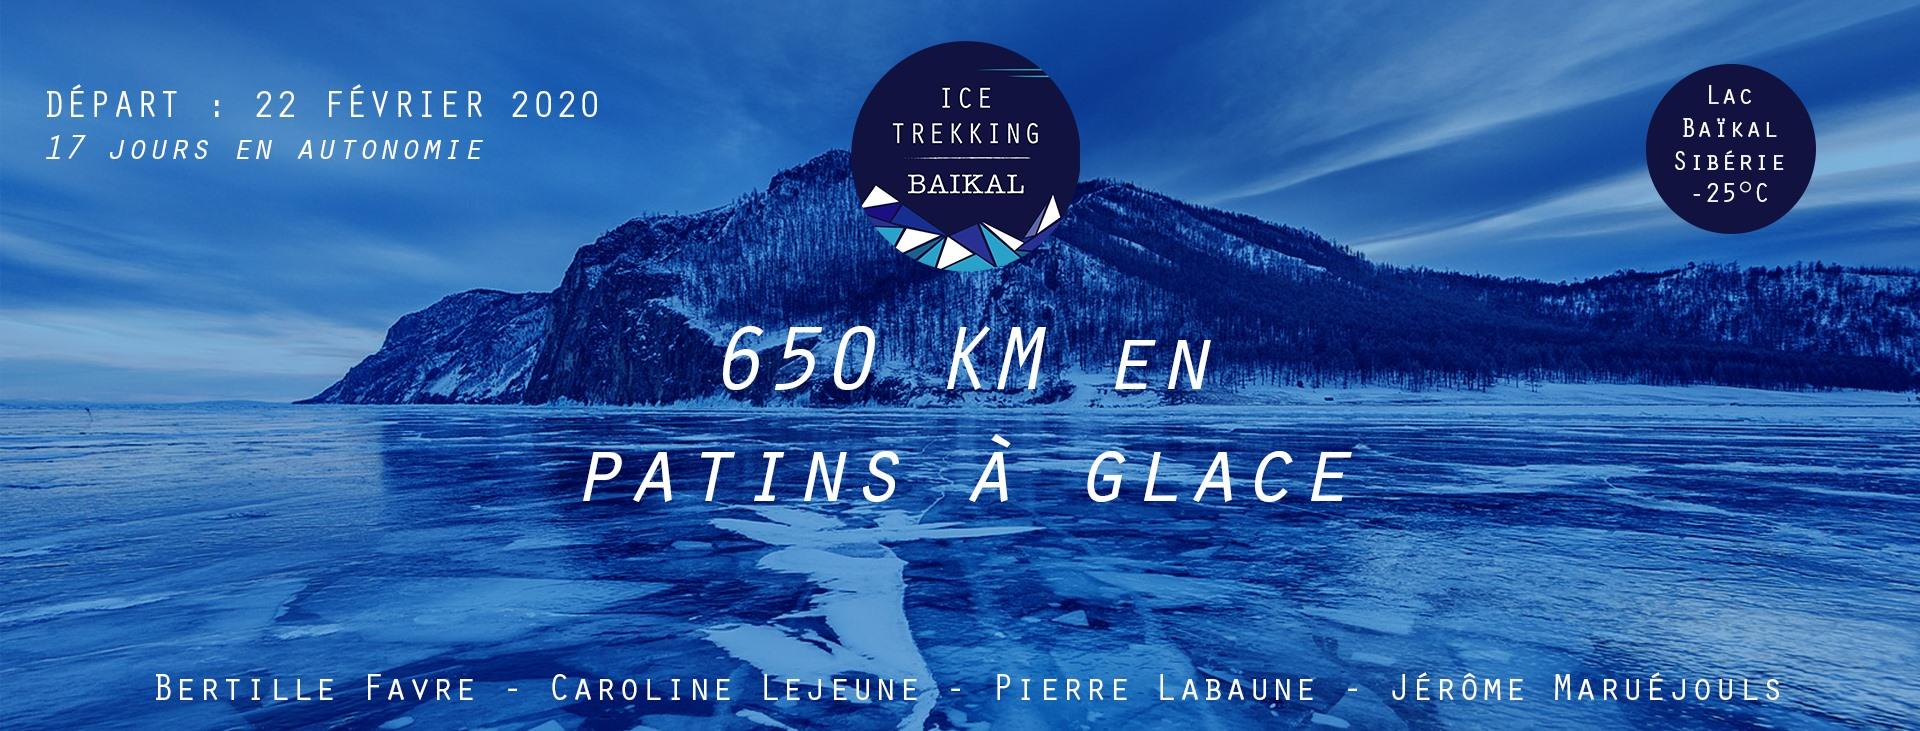 Sponsor Ice Trekking